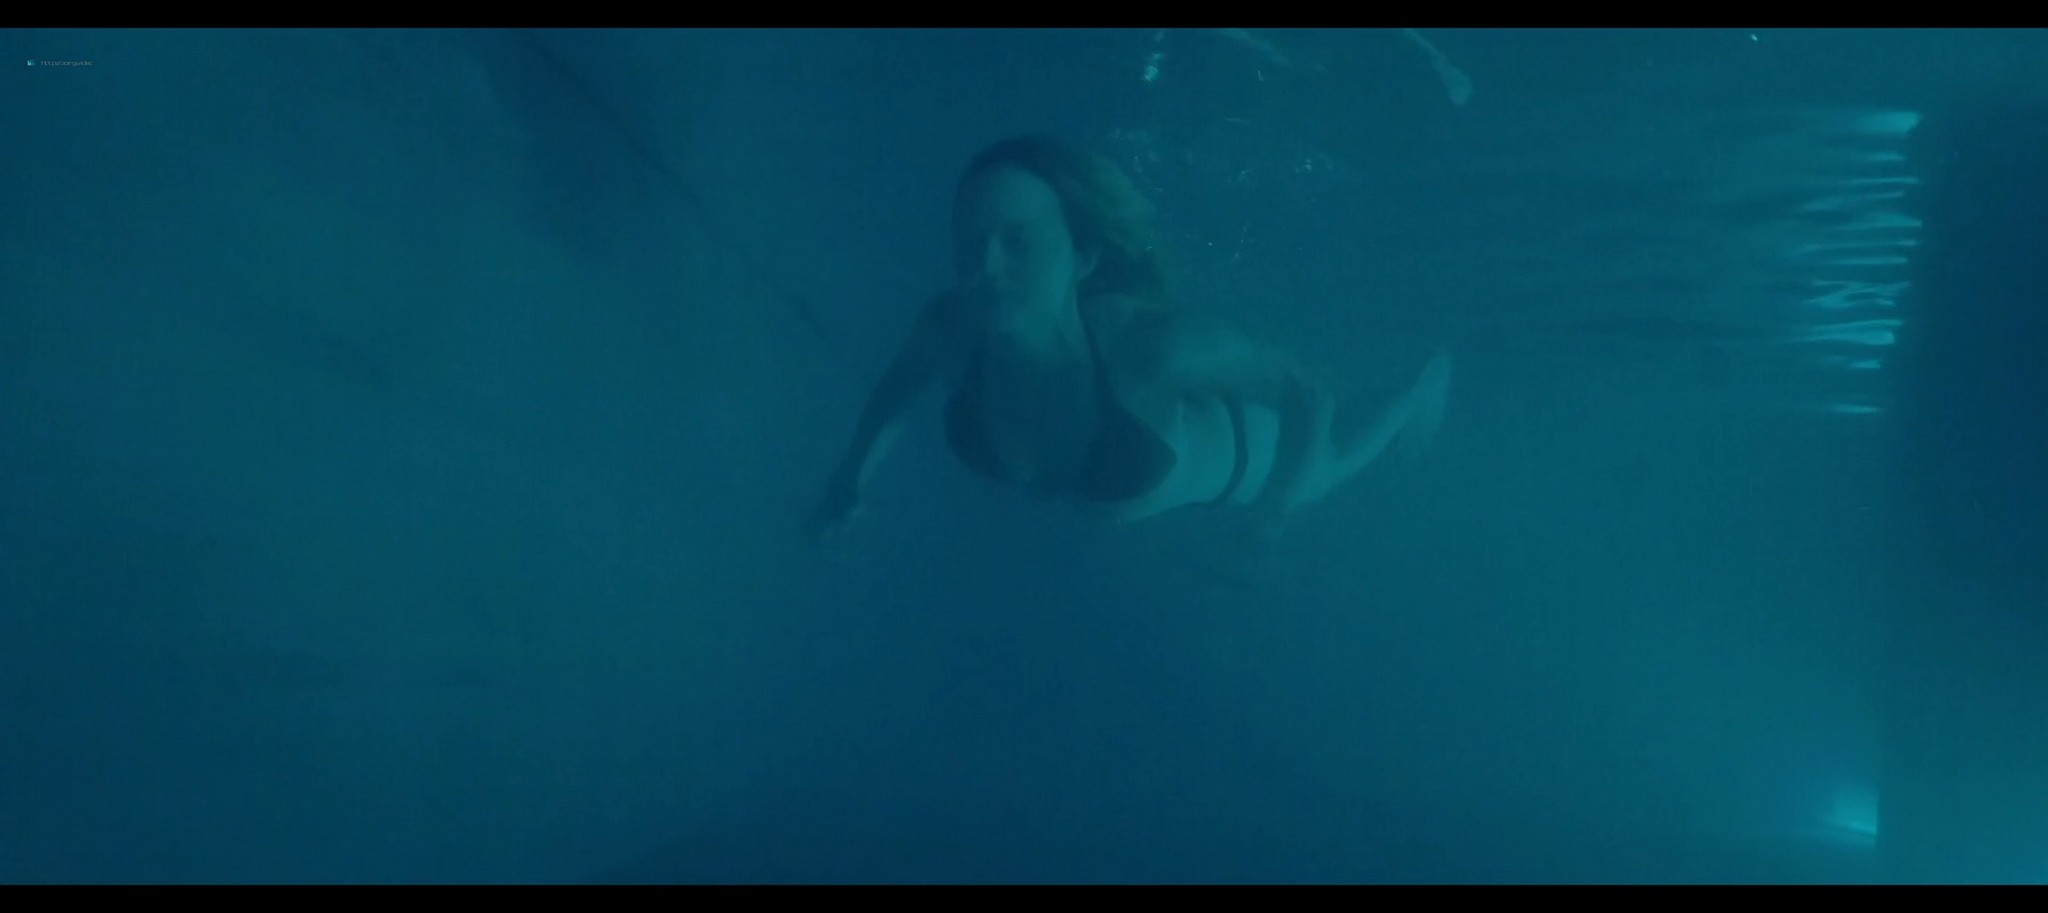 Heather Graham sexy Sophie Nelisse Jodi Balfour hot The Rest of Us 2019 1080p WEB 11